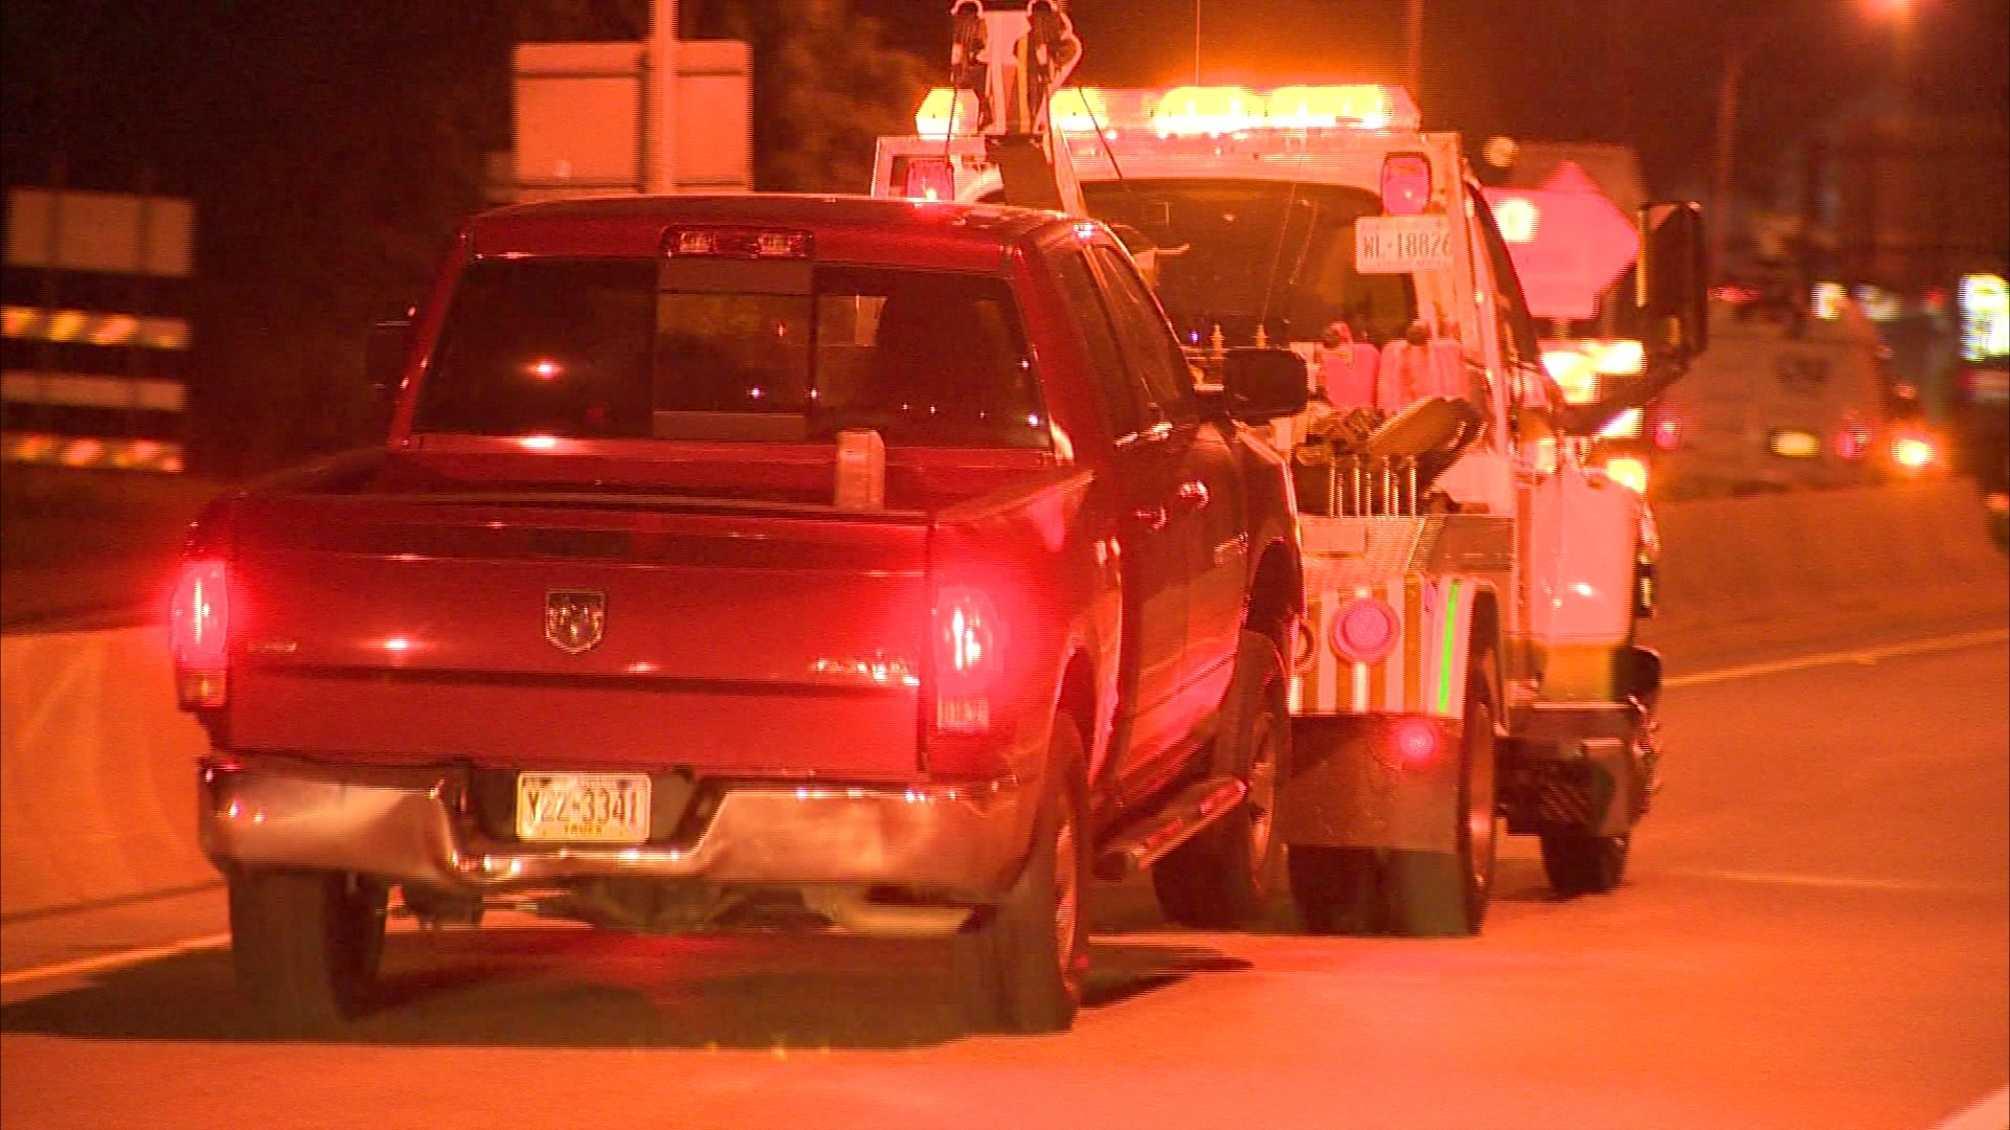 img-chase vehicle towed